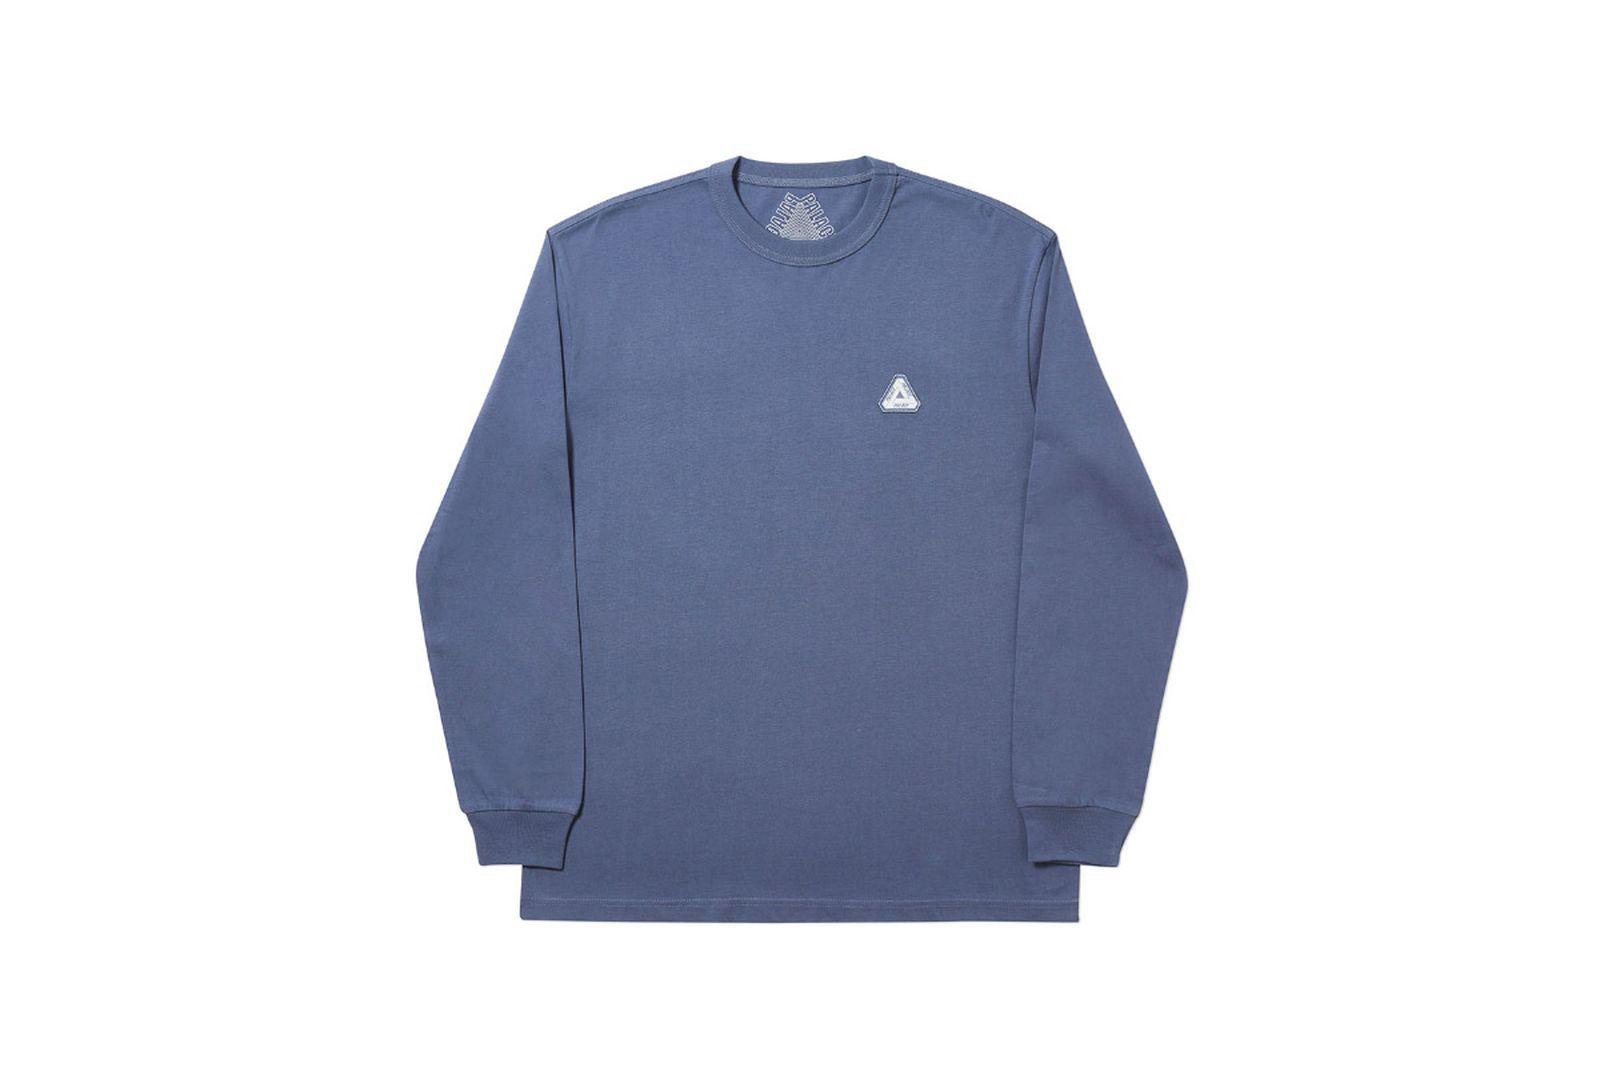 Palace 2019 Autumn Longsleeve T Shirt blue